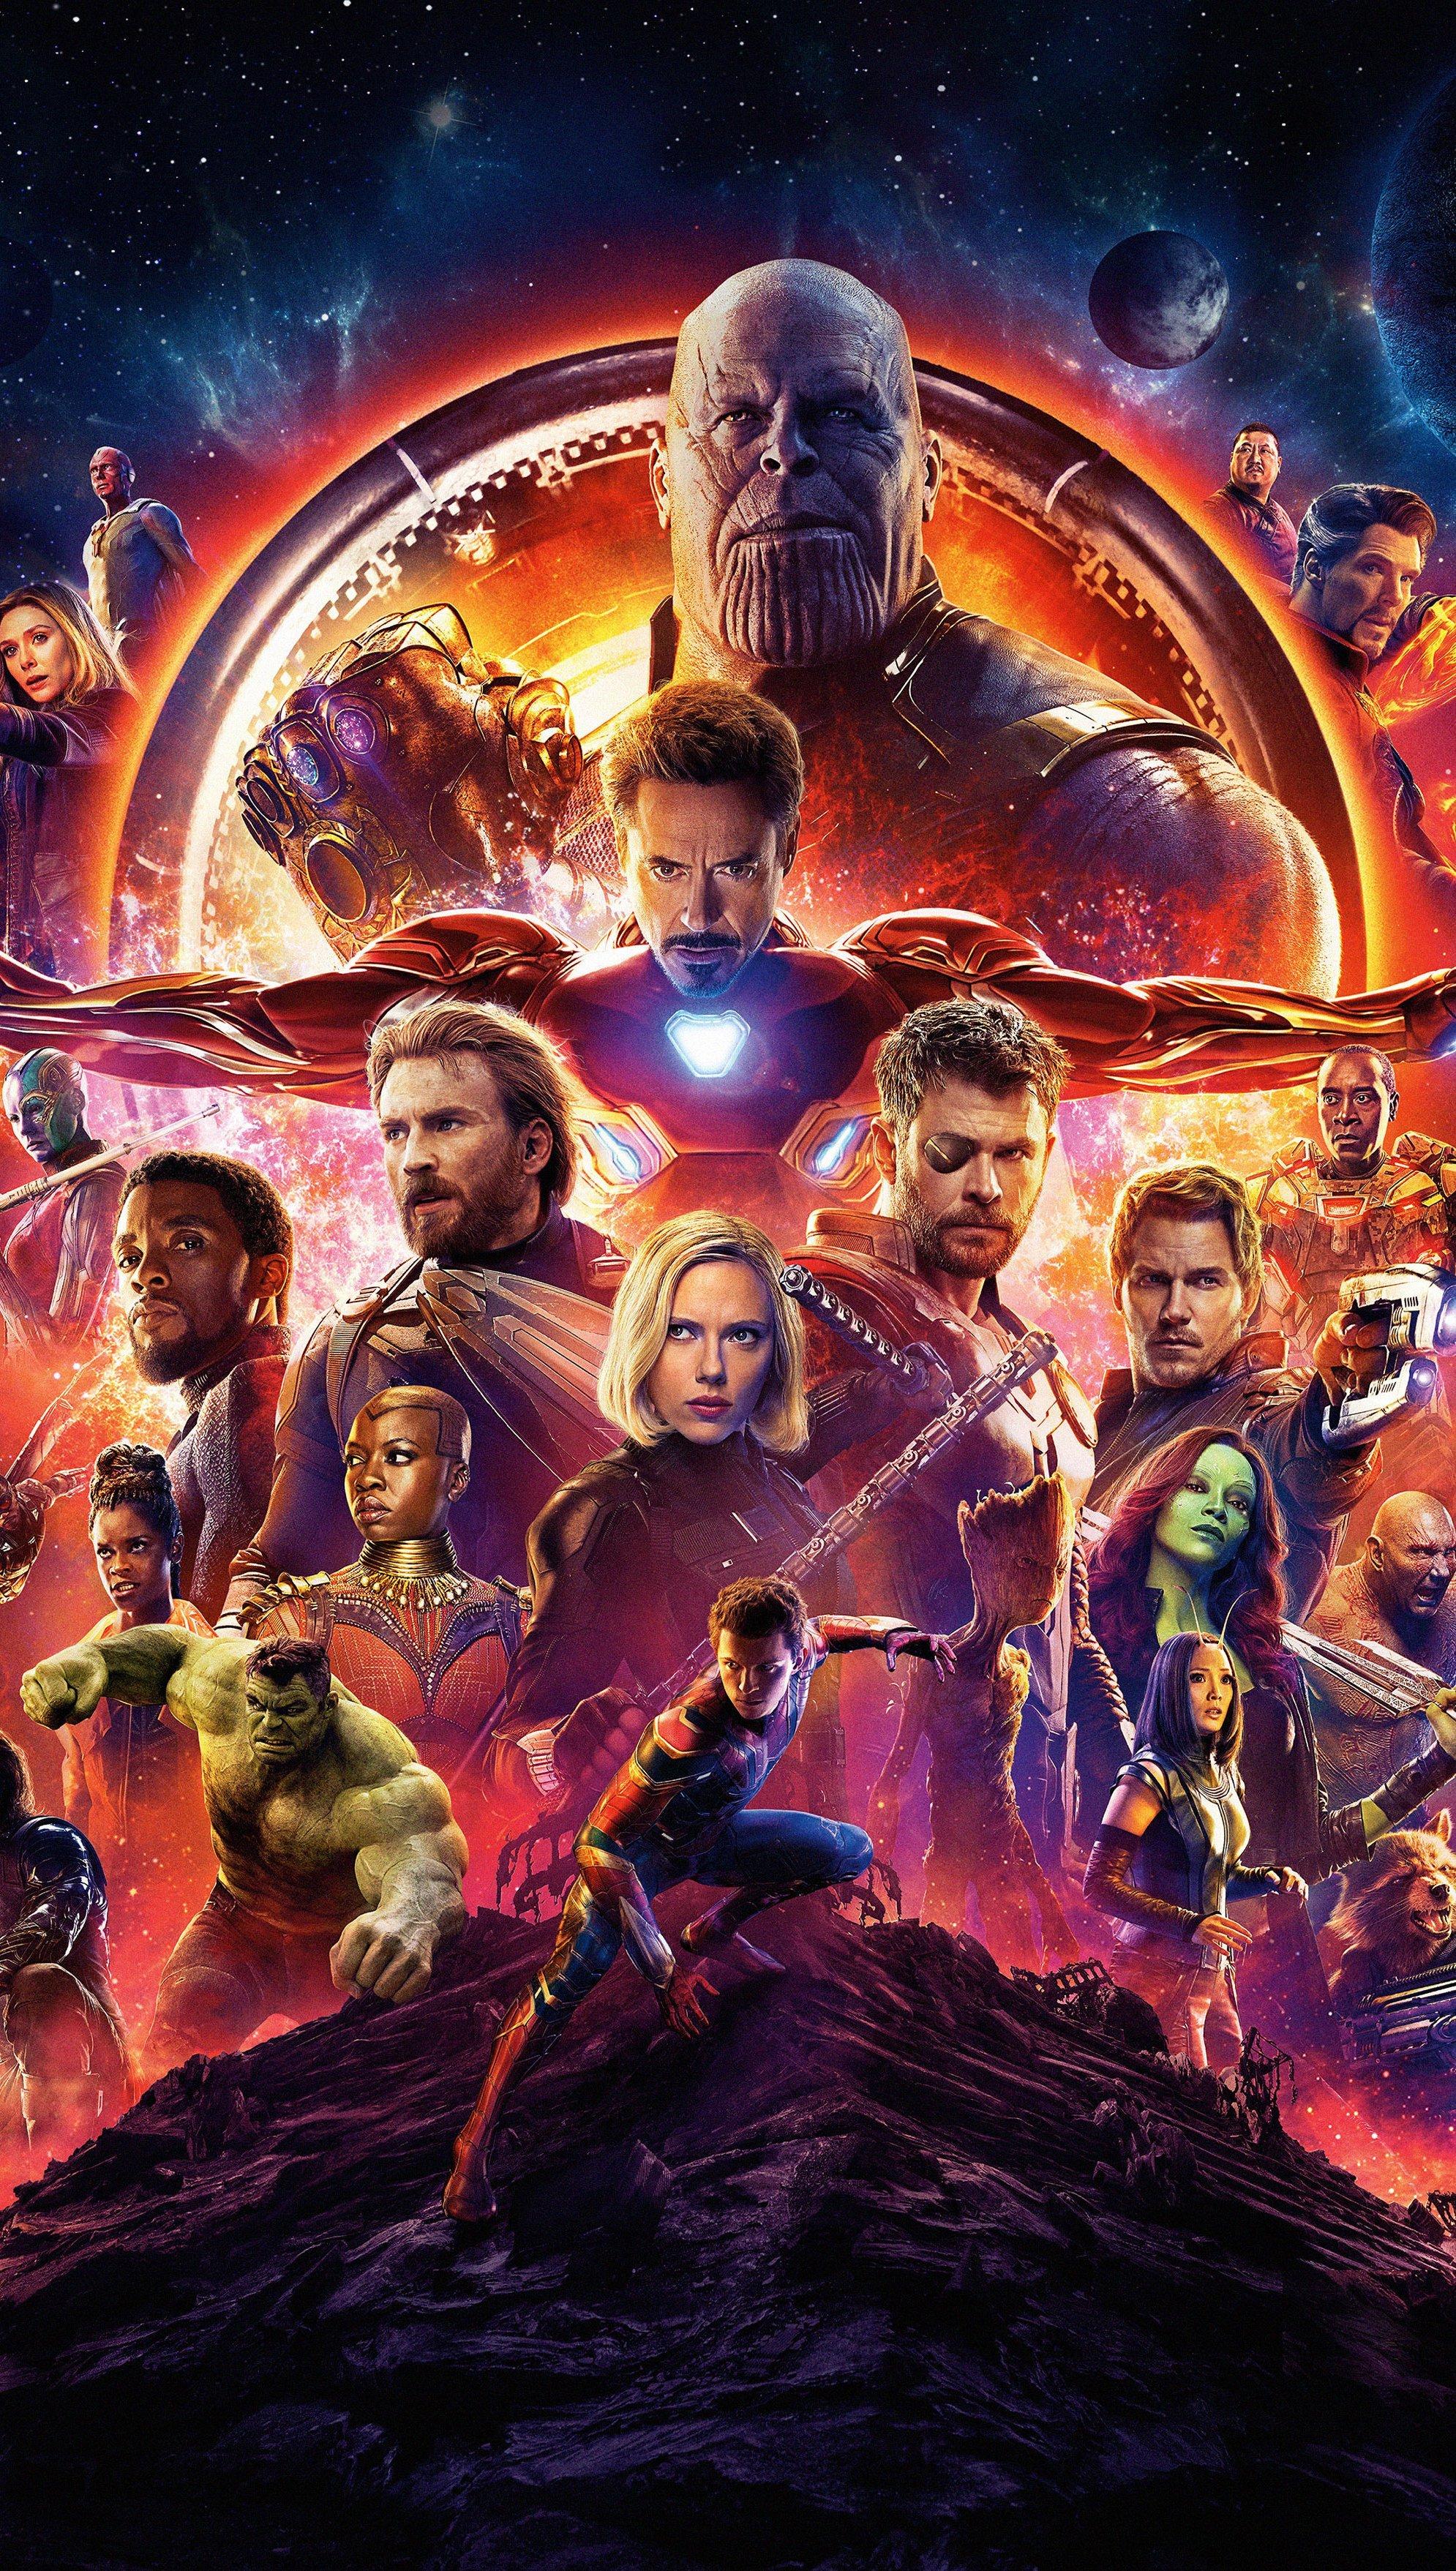 Fondos de pantalla Avengers Infinity War Vertical